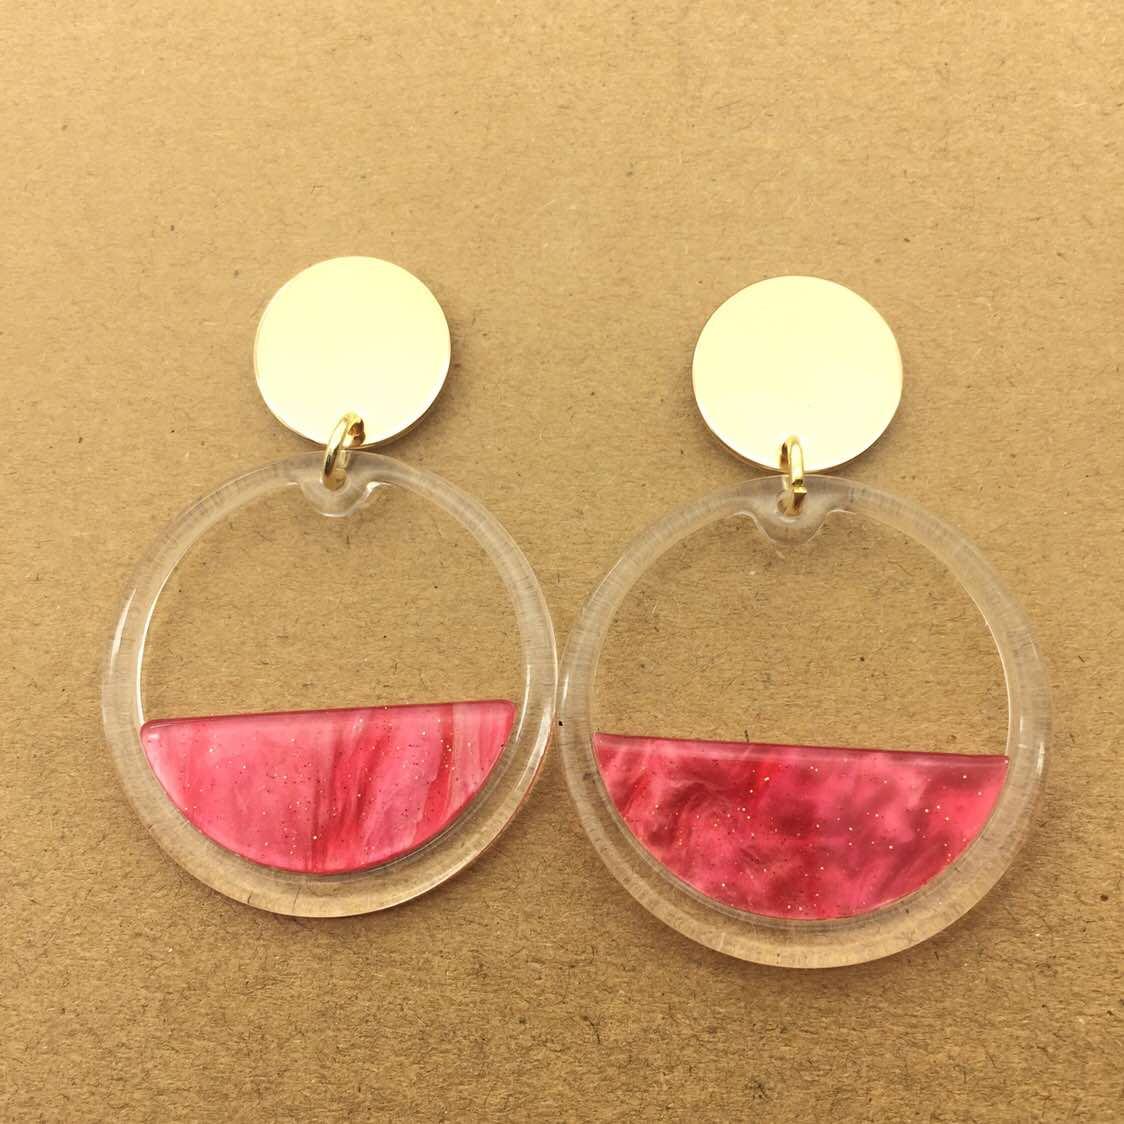 Vintage Earings Large Round Acrylic Earrings for Women Fashion Jewelry Brincos Boho Earring Pendientes Earing Brinco Oorbellen